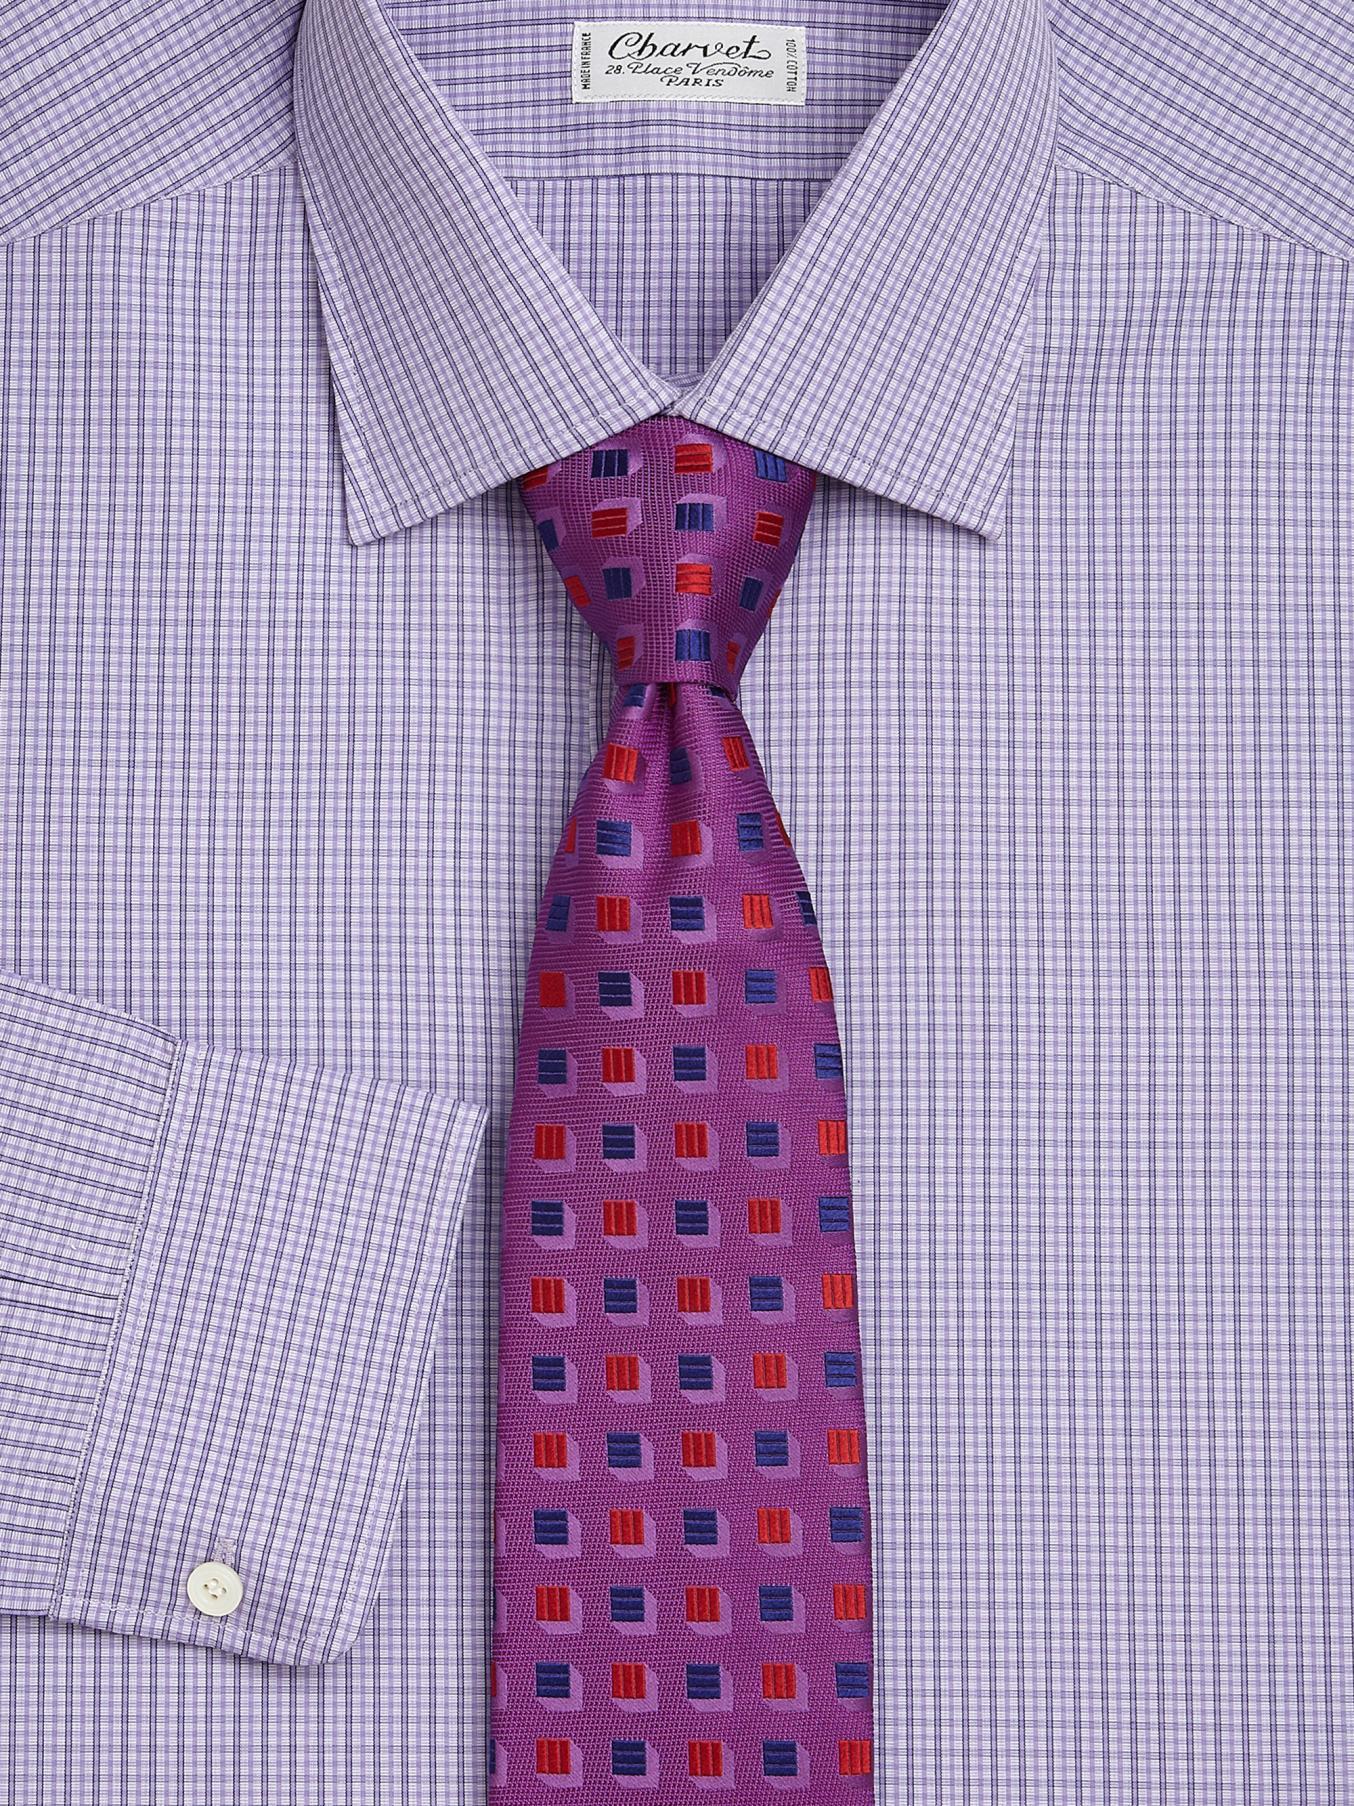 Lyst Charvet Plaid Slim Fit Cotton Dress Shirt In Purple